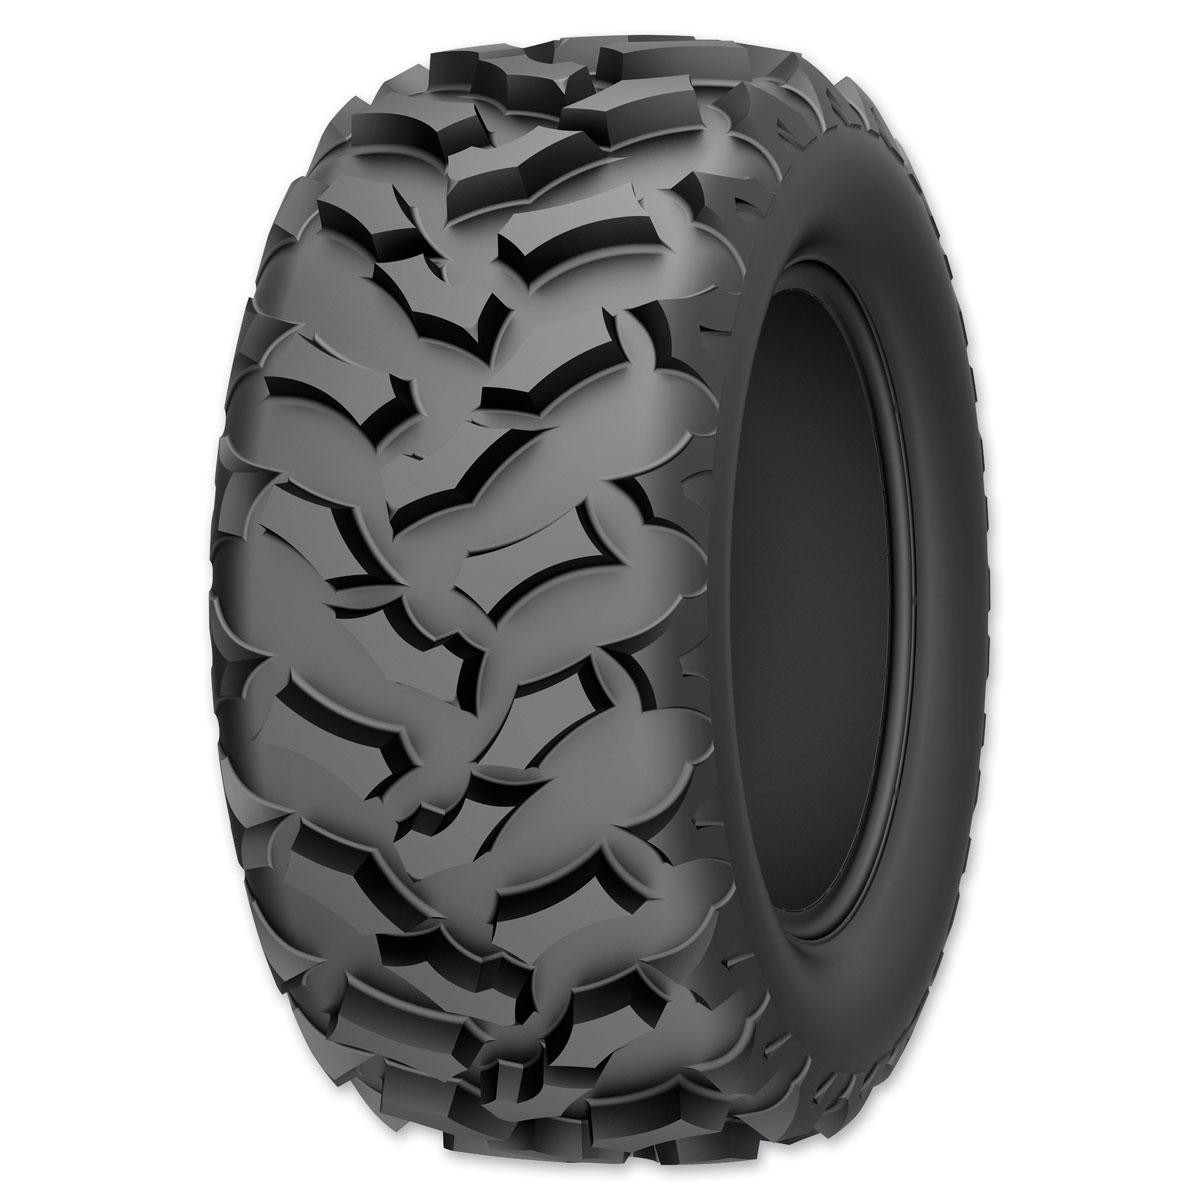 Kenda Tires Mastodon 30X10R-14 Front/Rear Tire